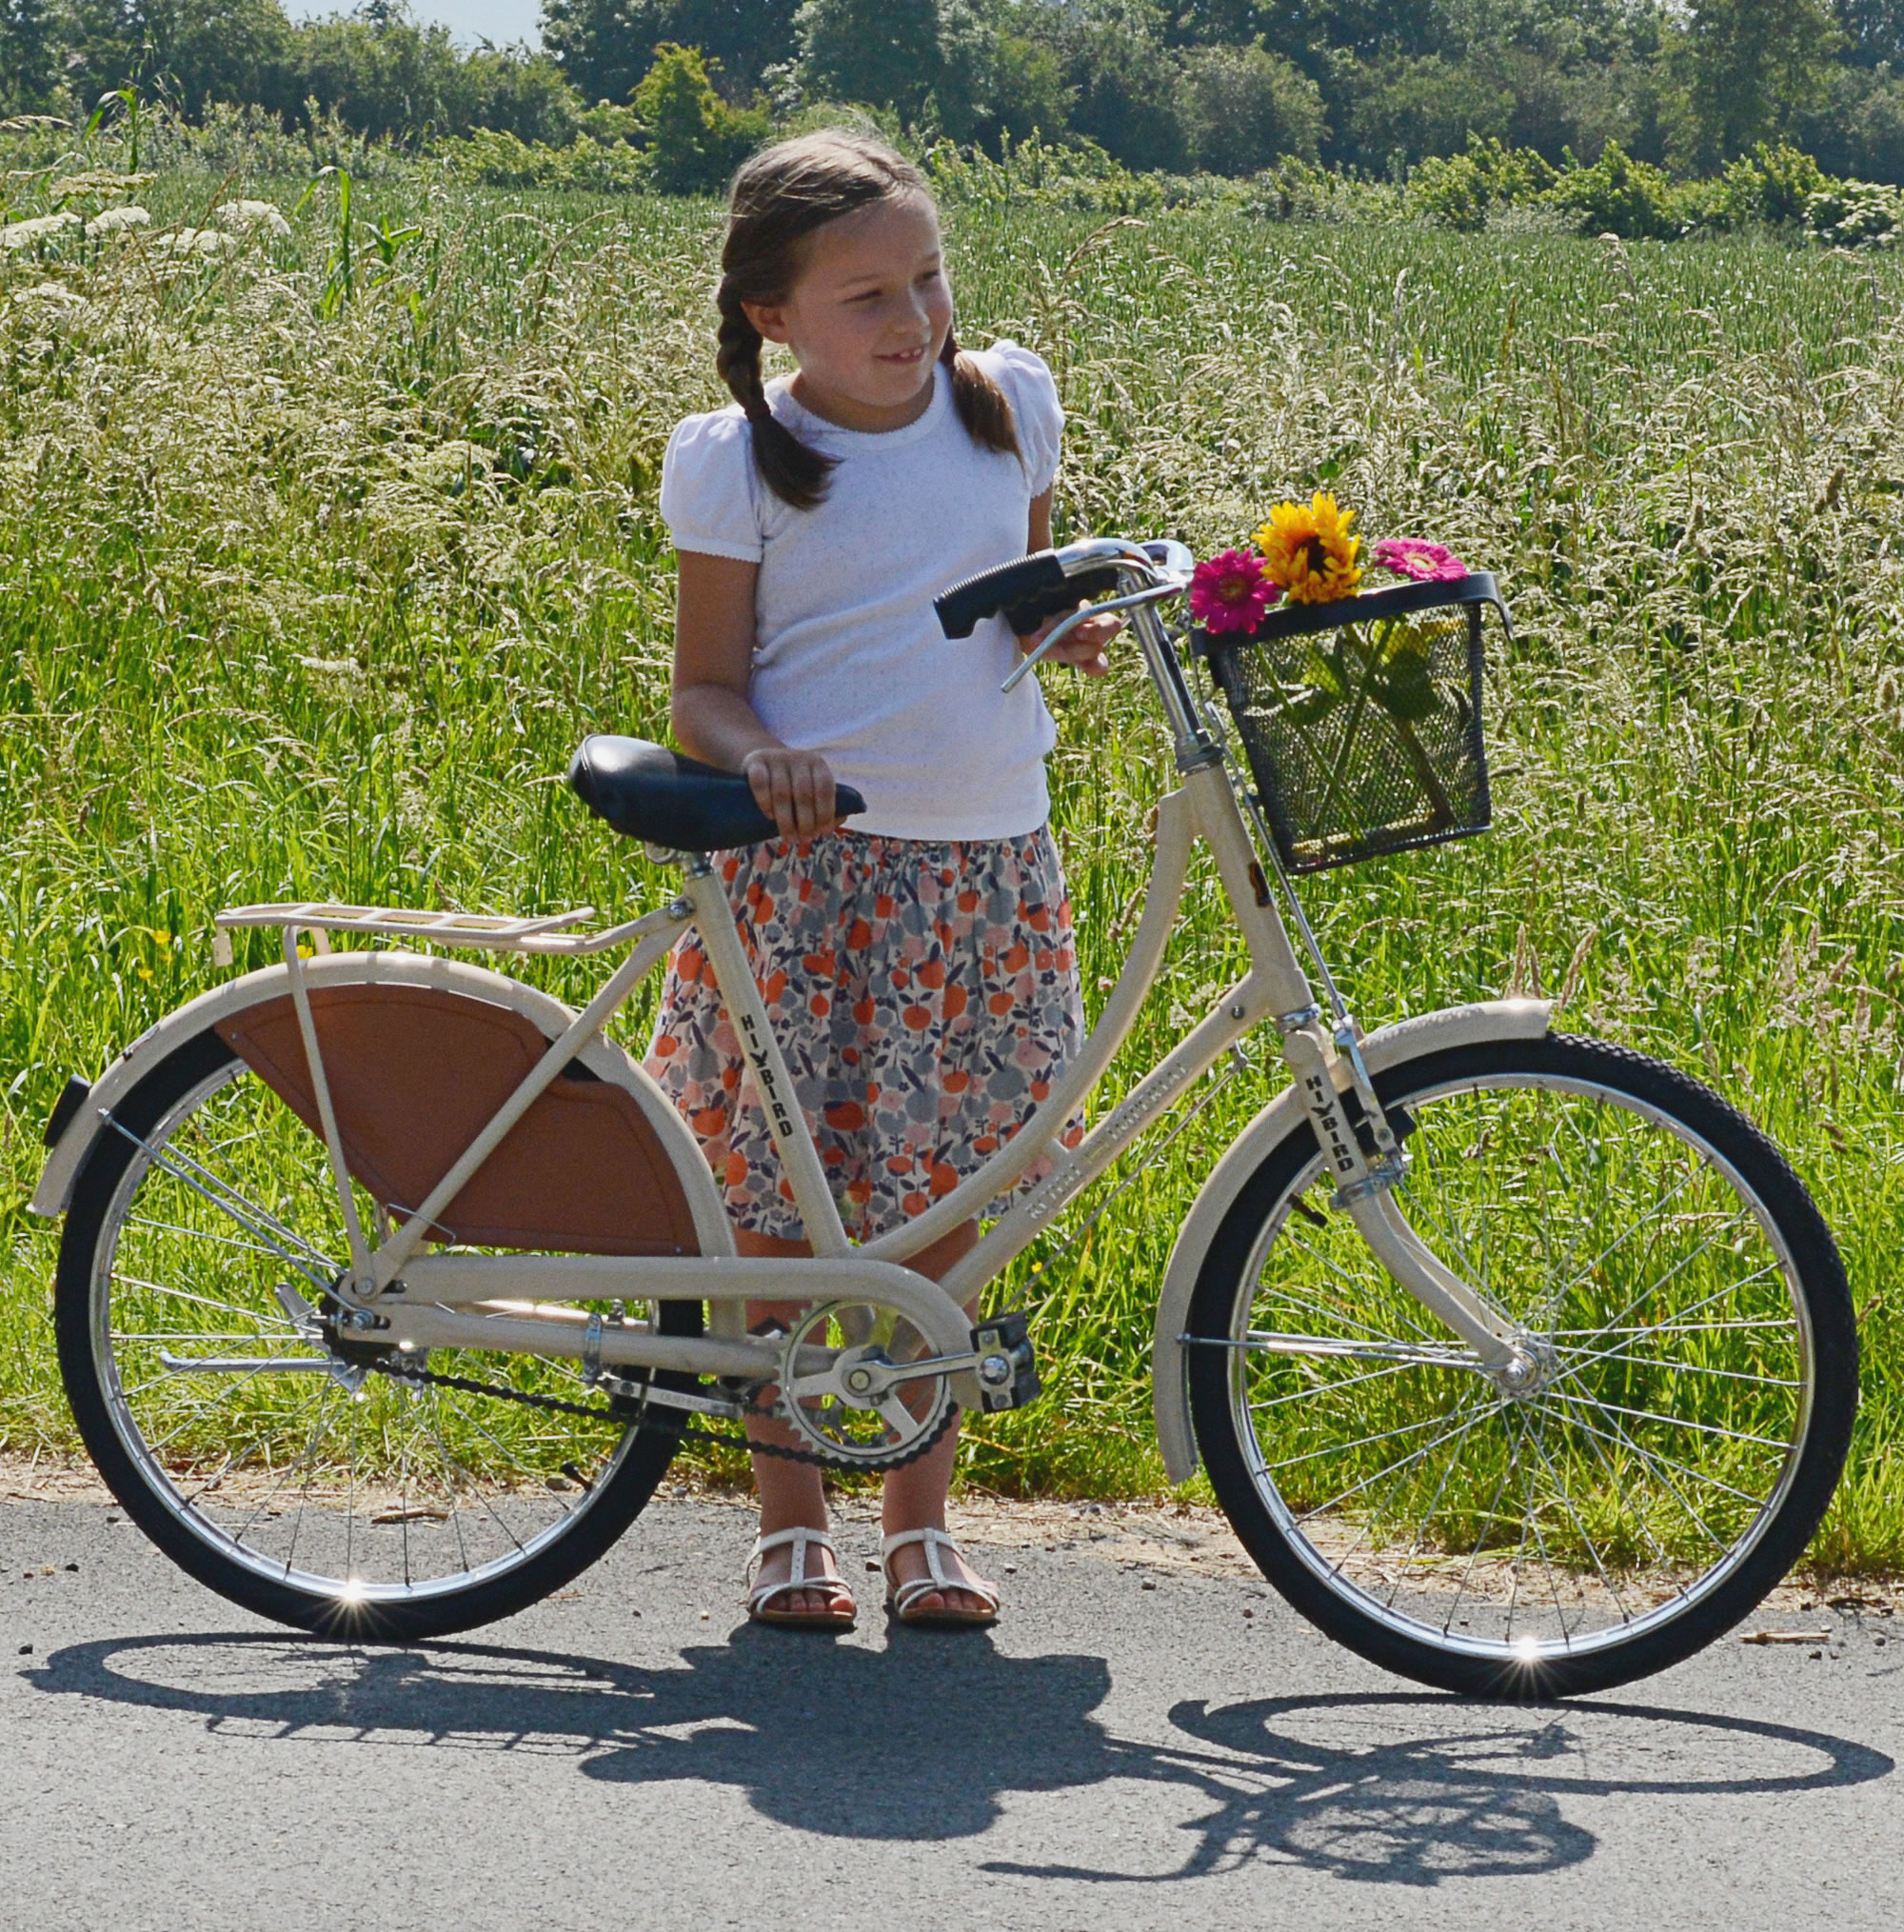 Pink Old Fashioned Bike